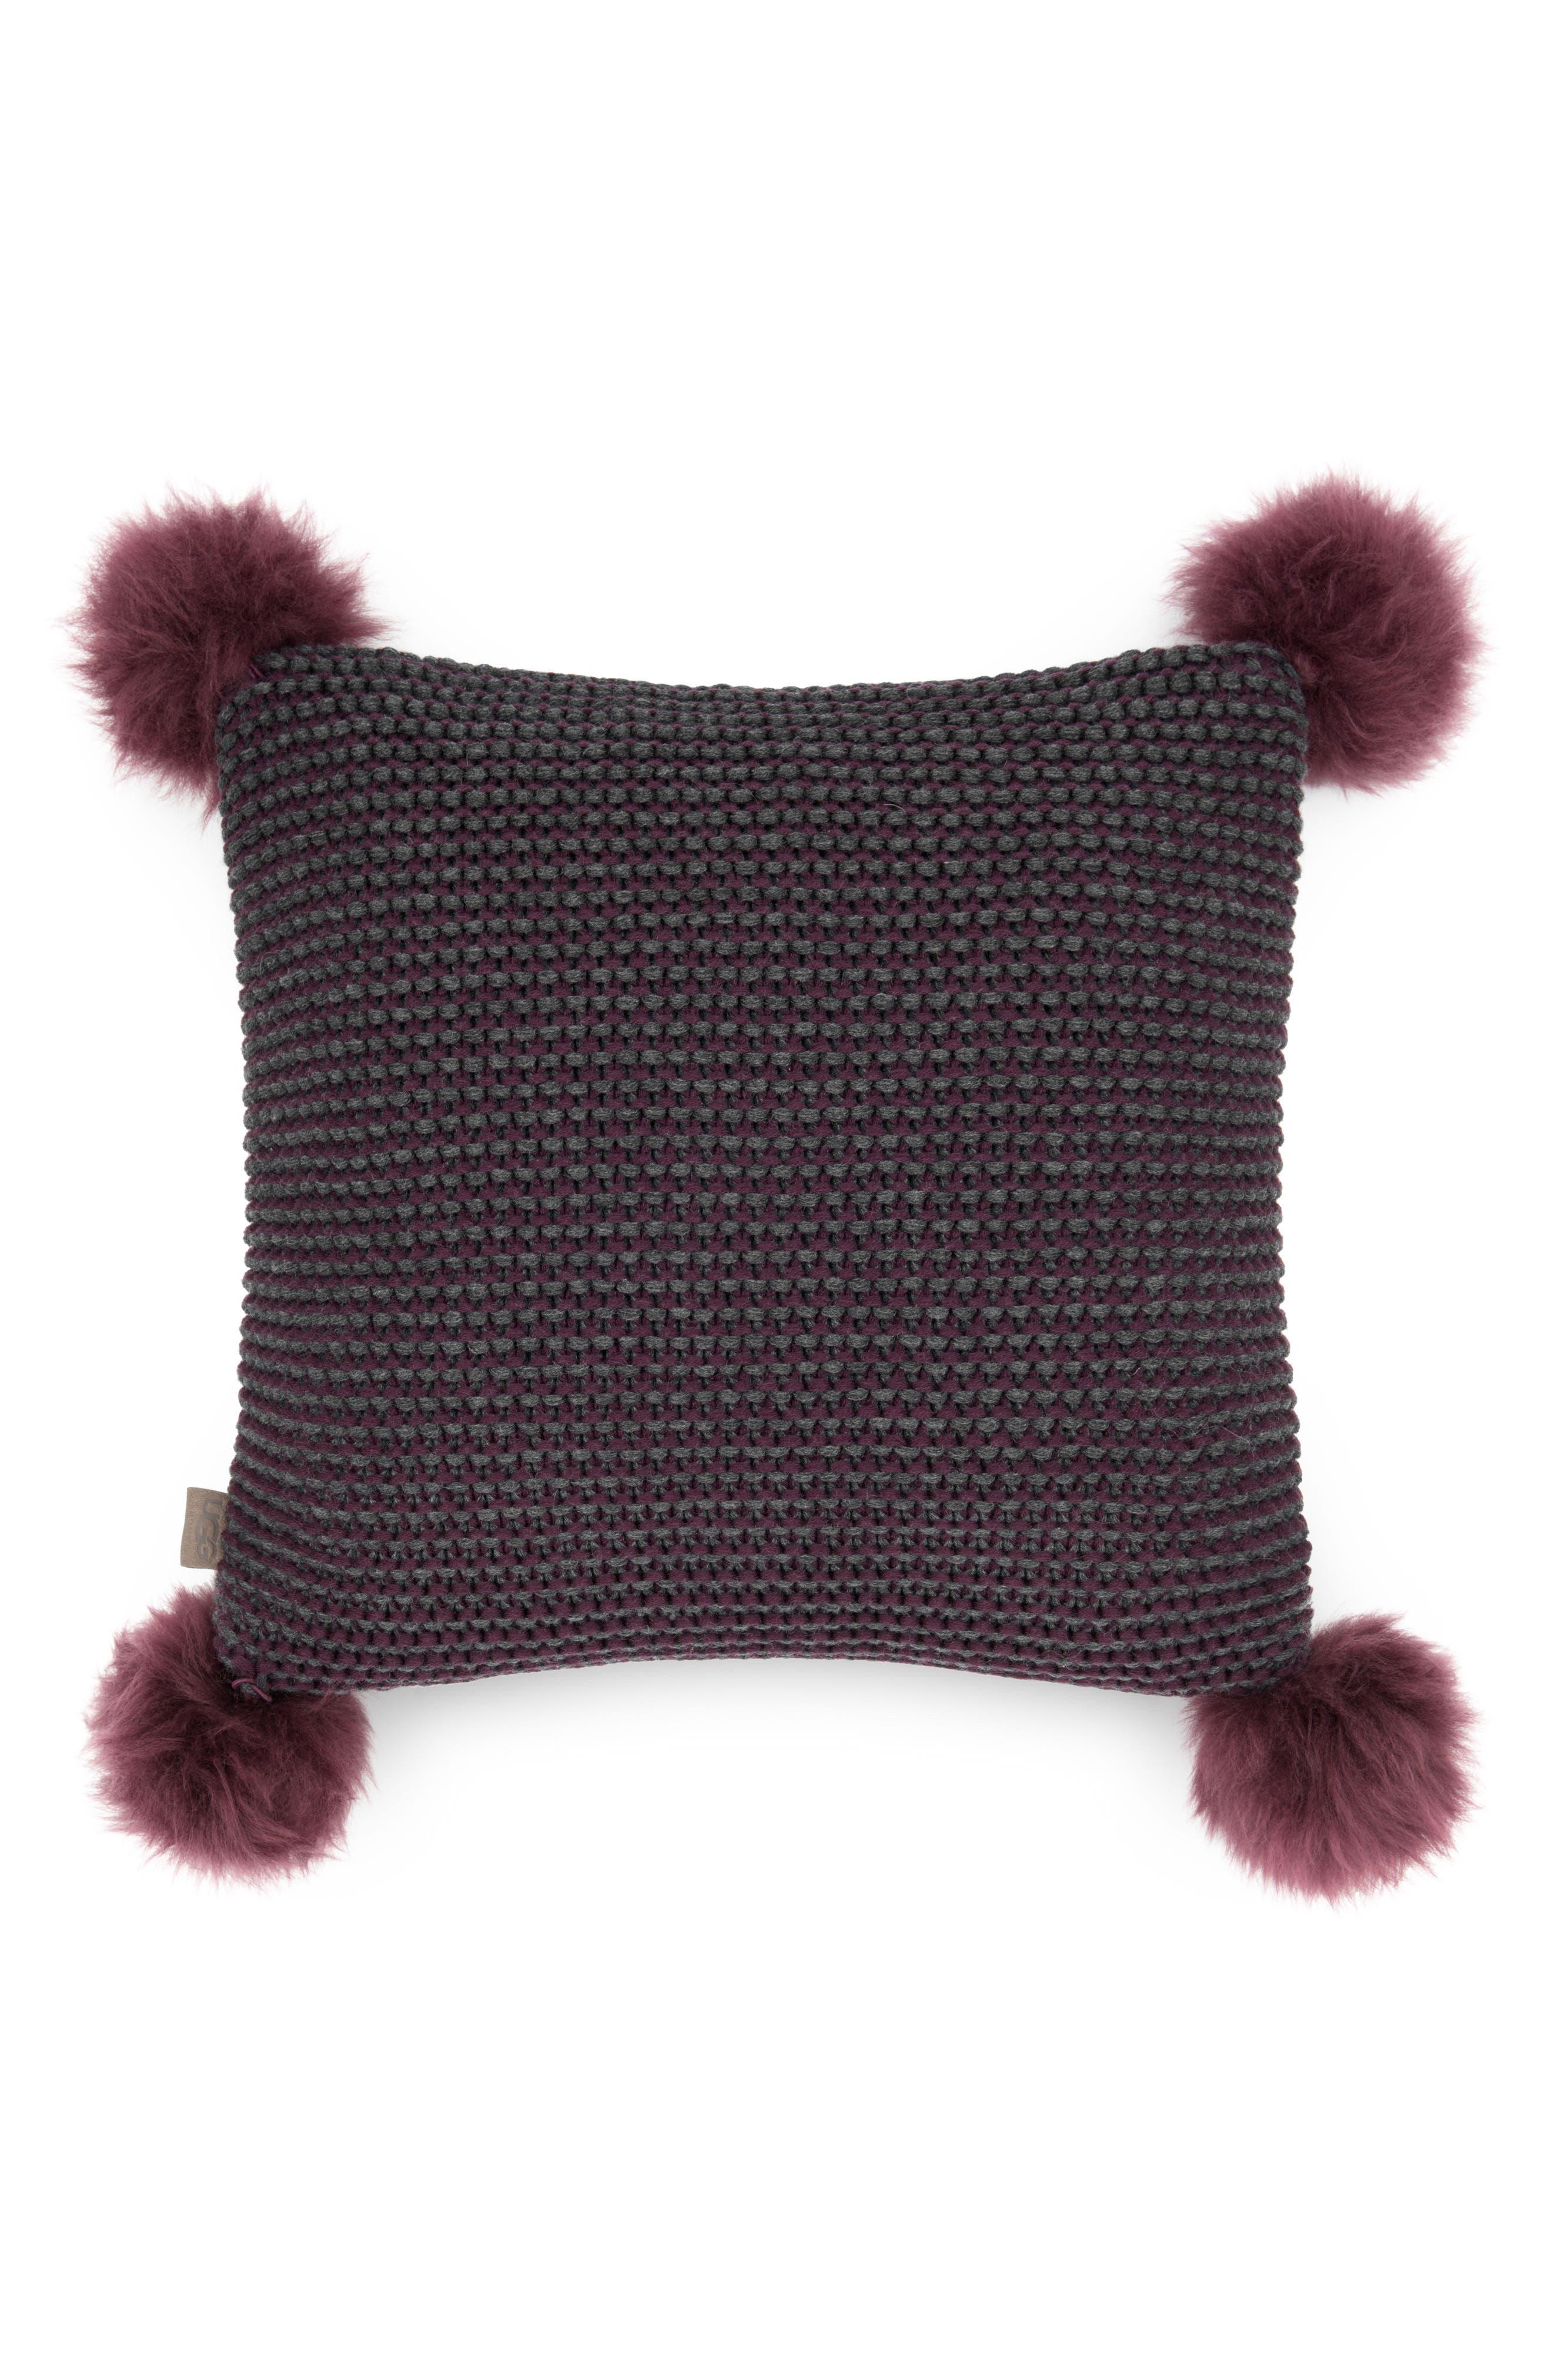 Alternate Image 1 Selected - UGG® Snow Creek Genuine Shearling Pillow